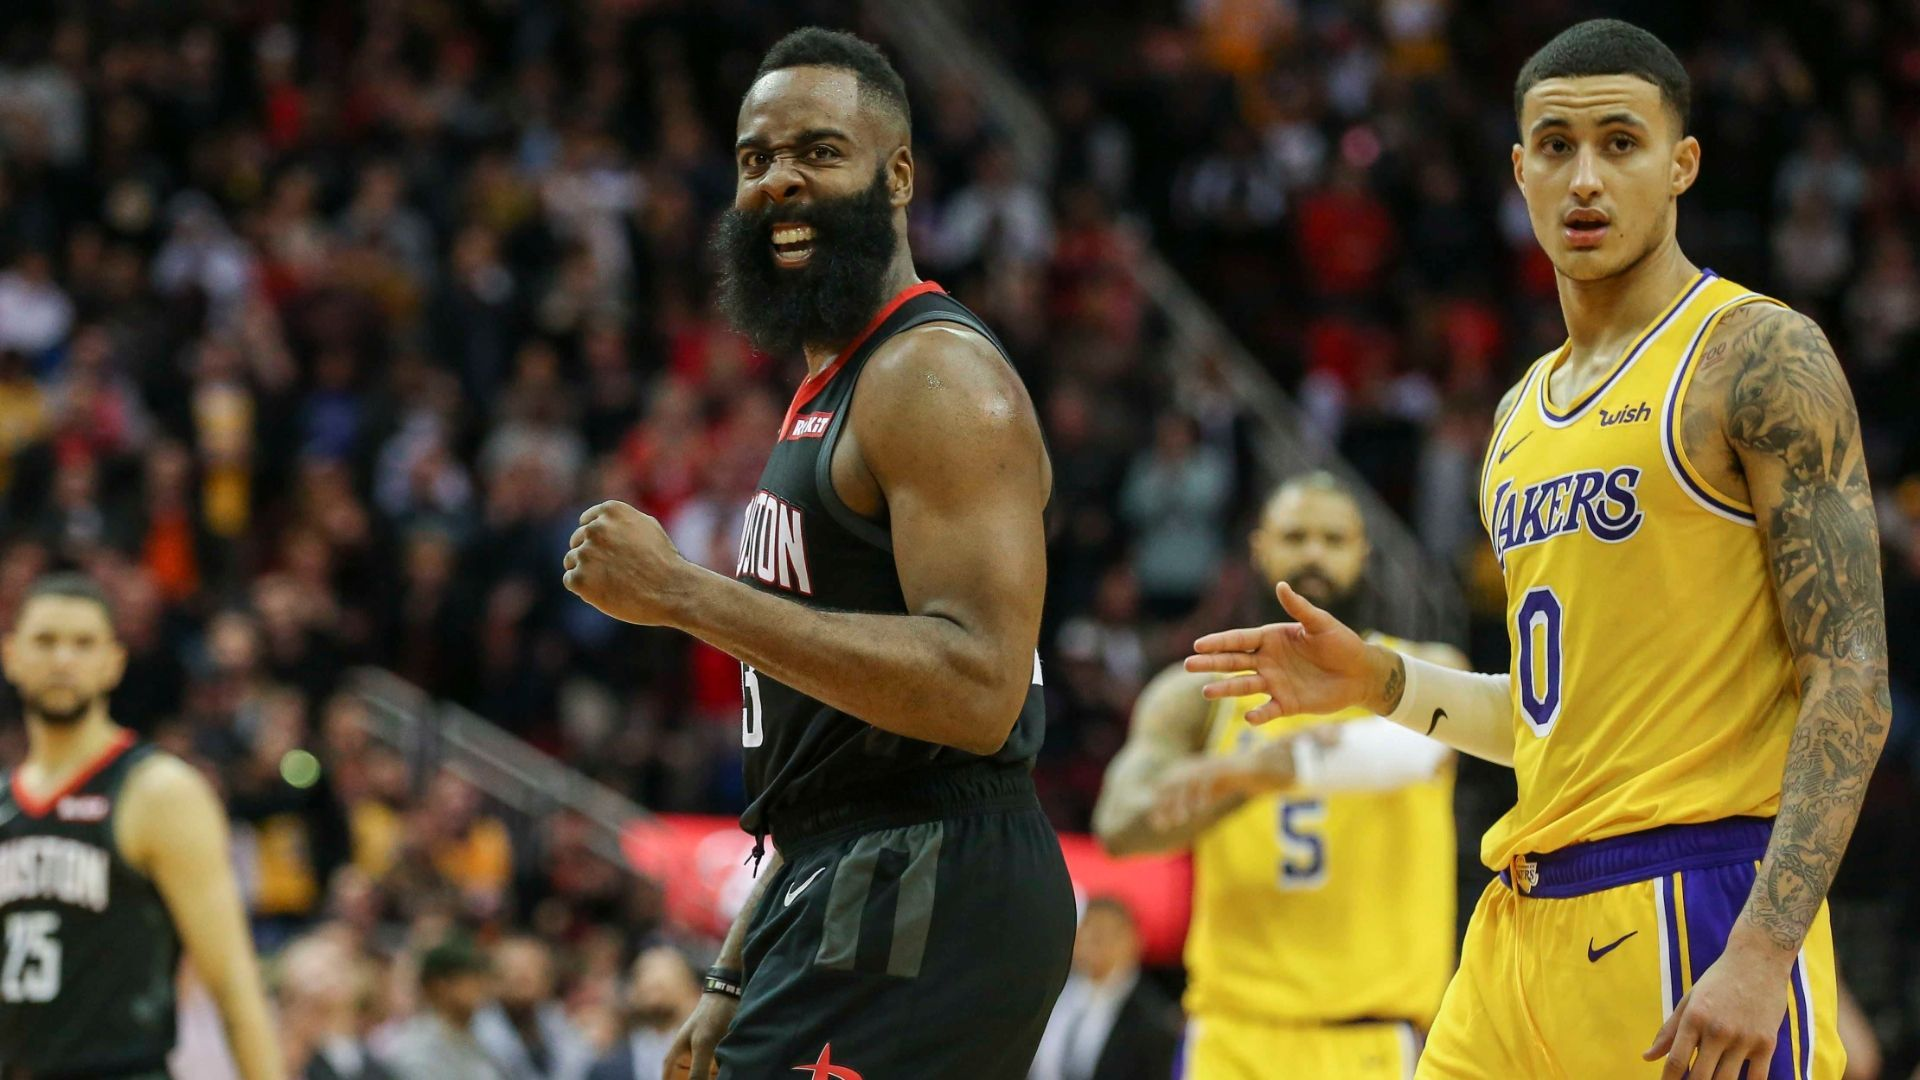 Harden Drops 48 Points In Rockets Ot Win Vs Lakers Espn Video Afc Championship Super Bowl Patriots